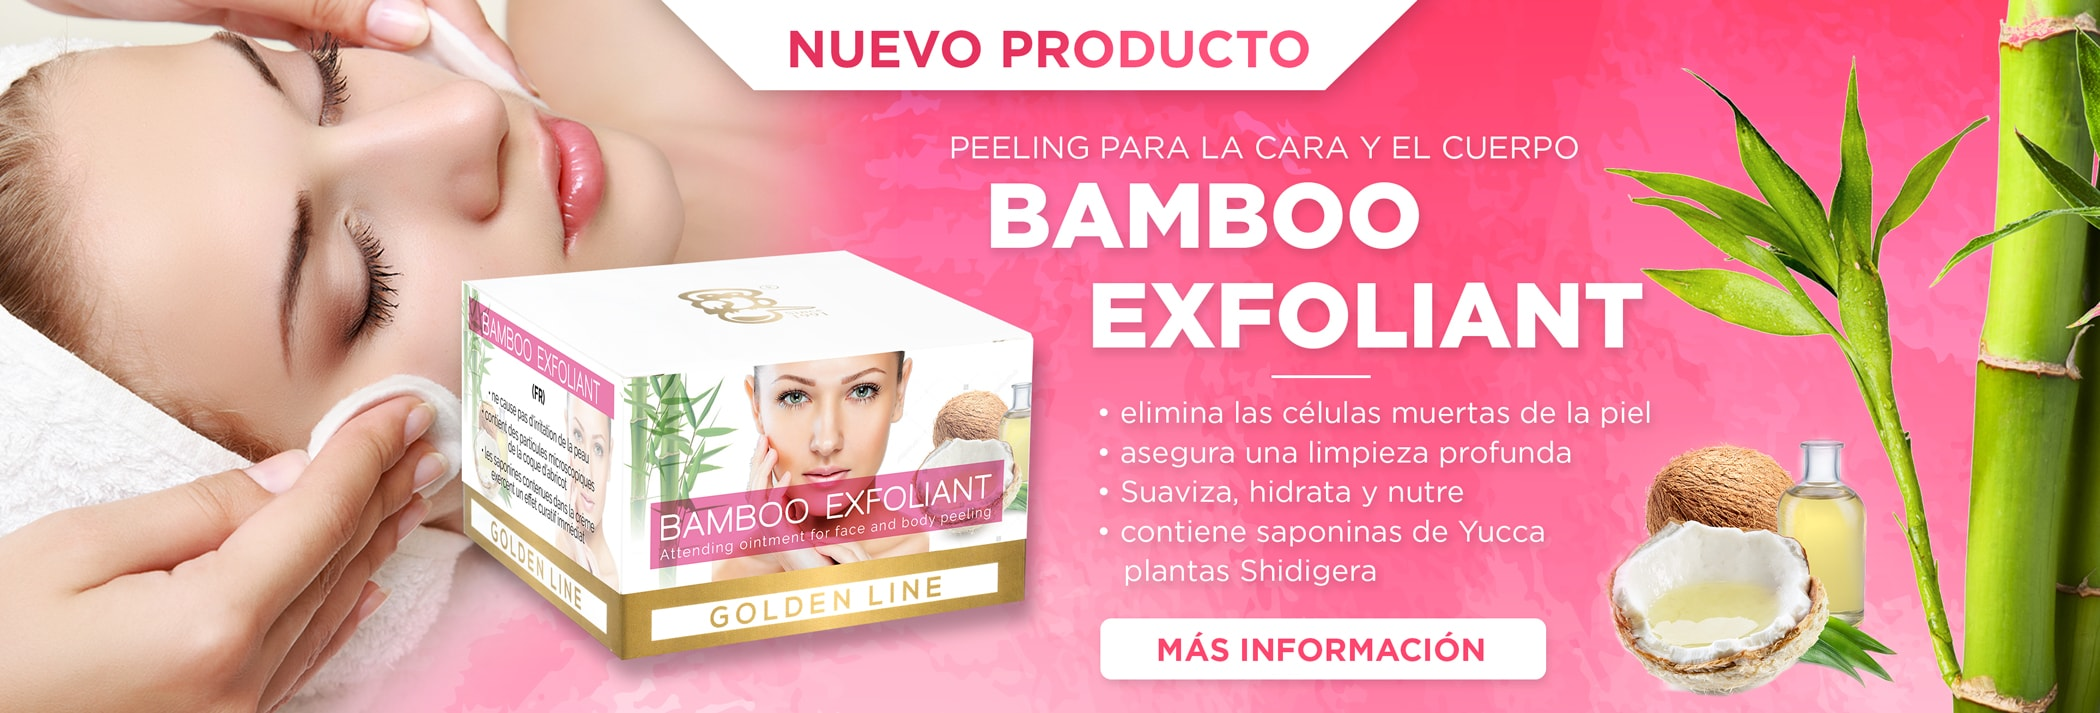 Bamboo-exfoliant-banner-ES